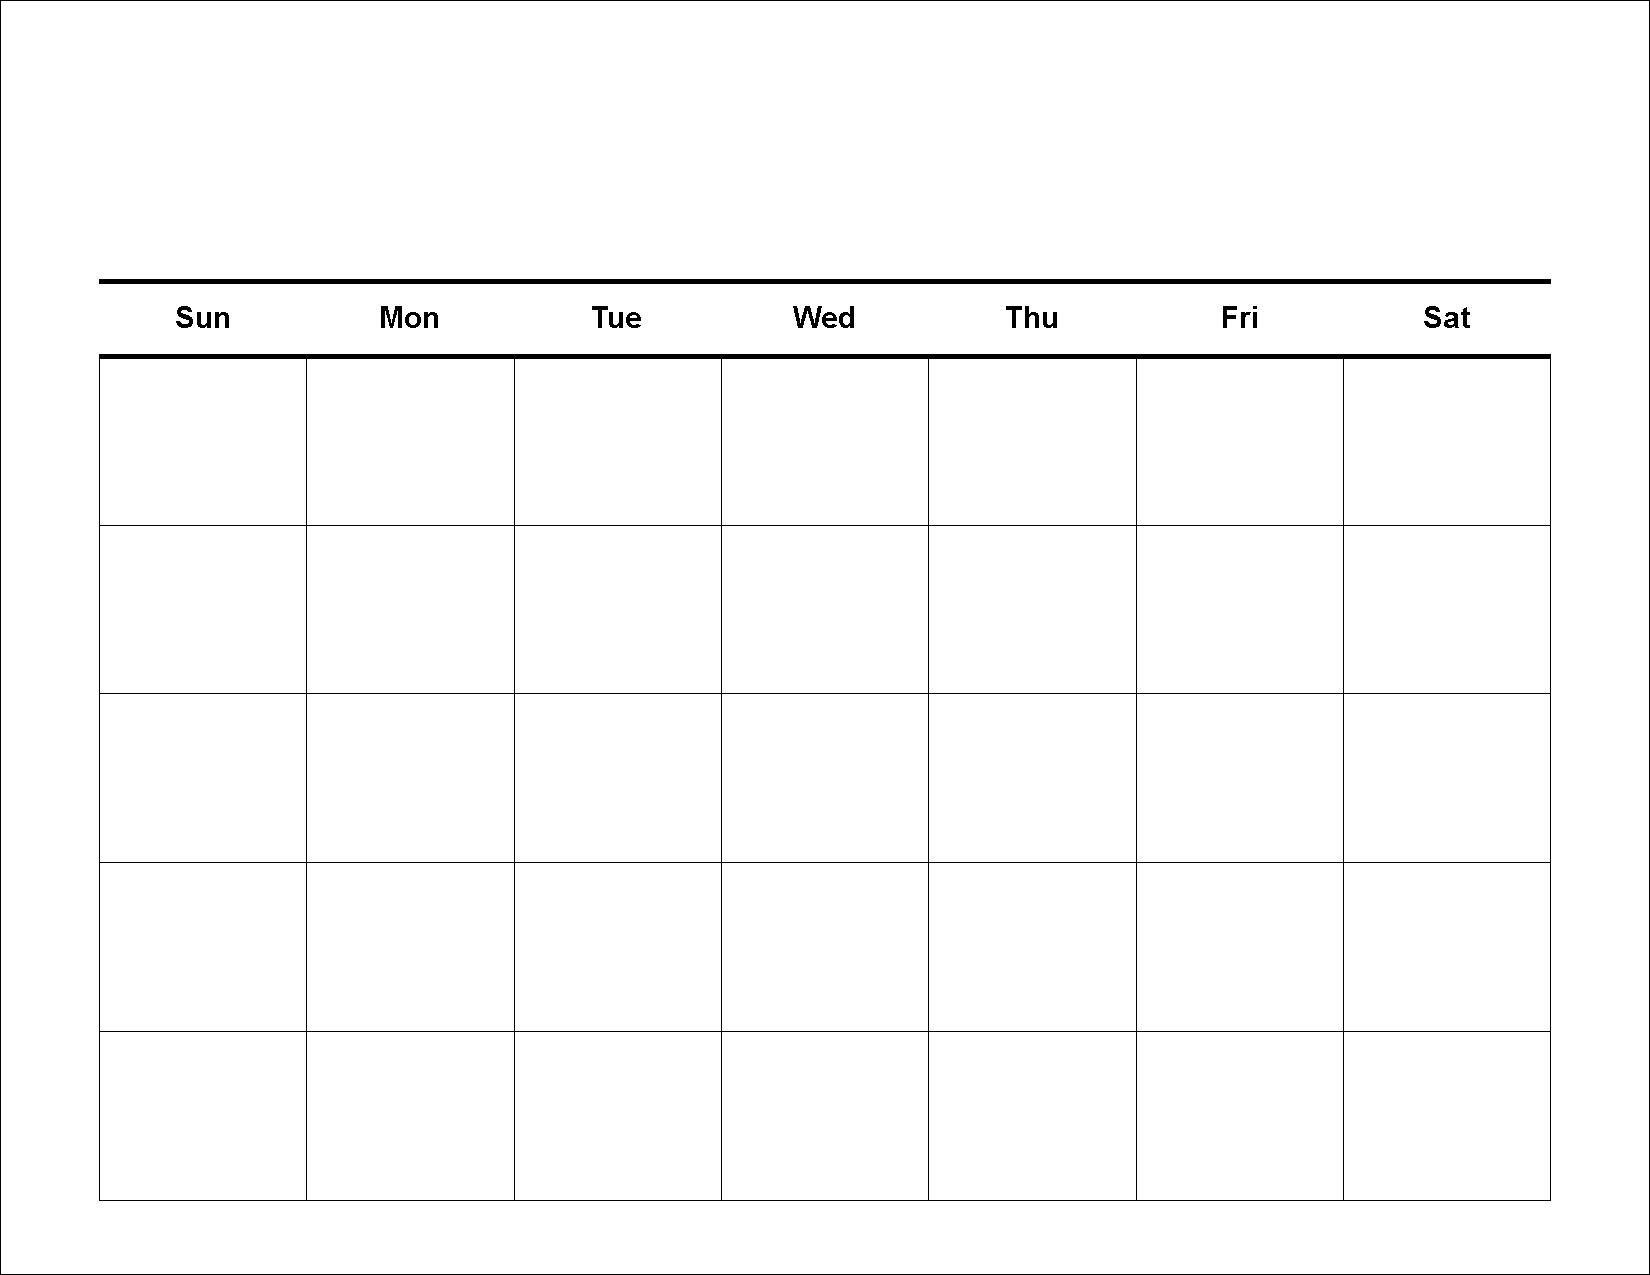 Free 5 Day Calendar Template | Printable Calendar Templates 2019 with Free 5 Day Calendar Template